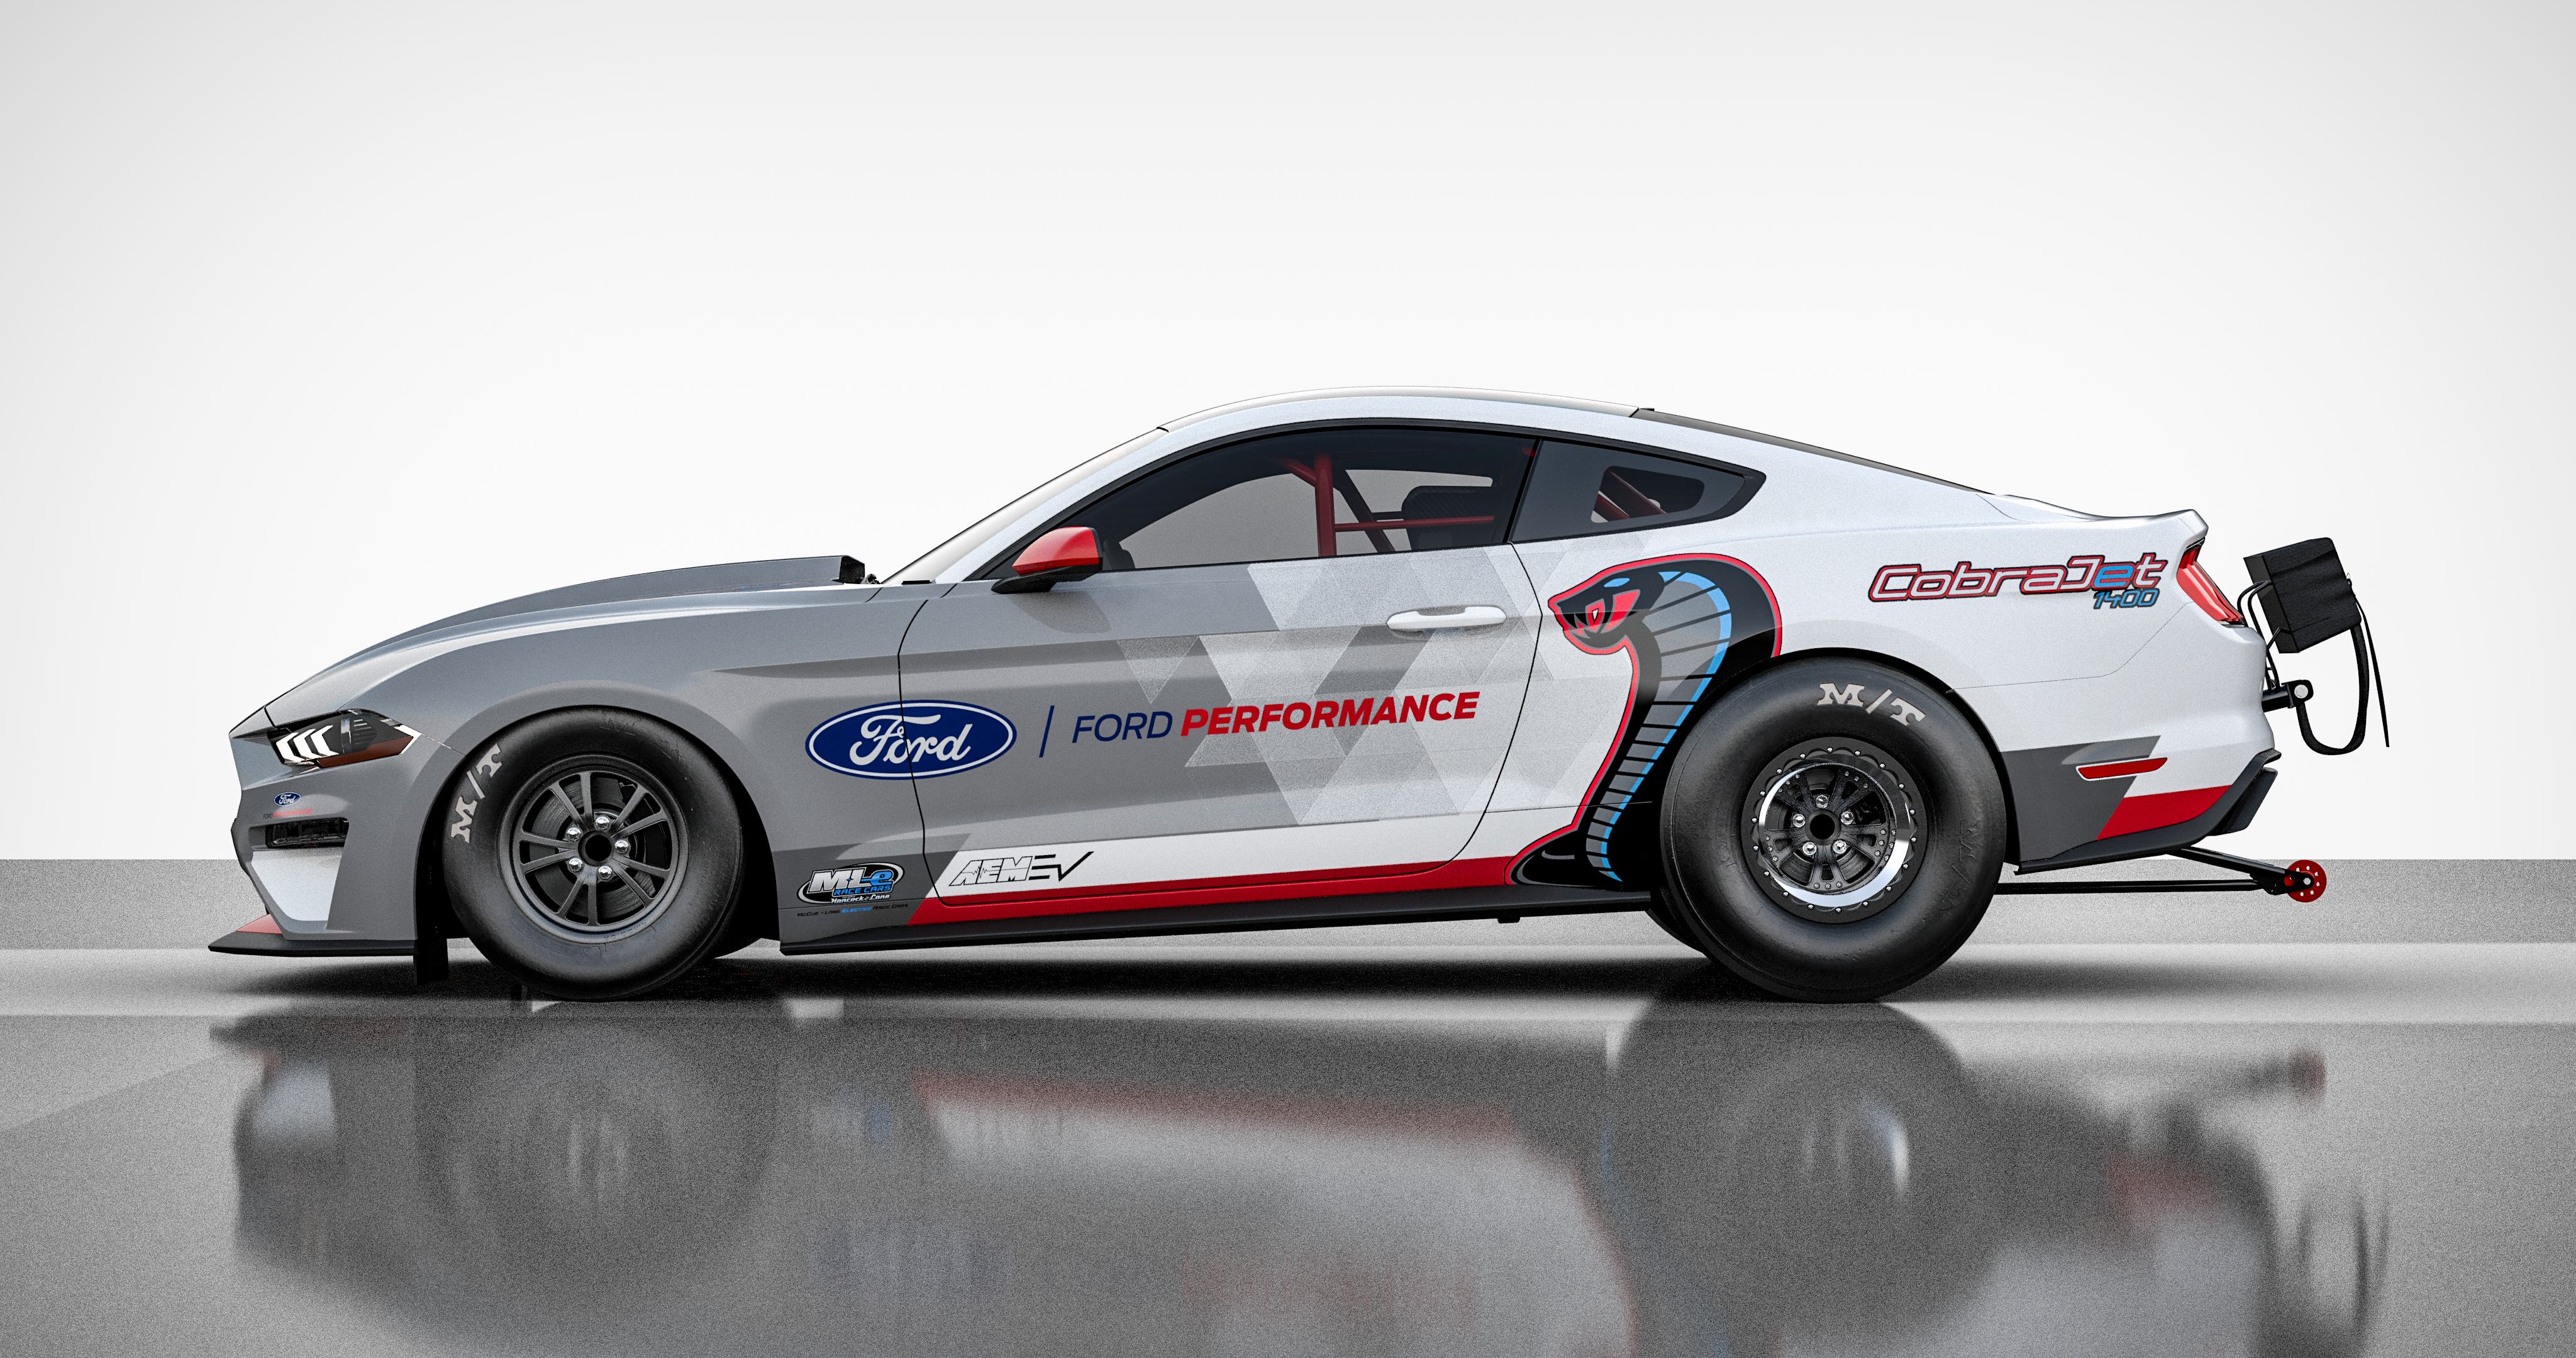 Mustang drag racer